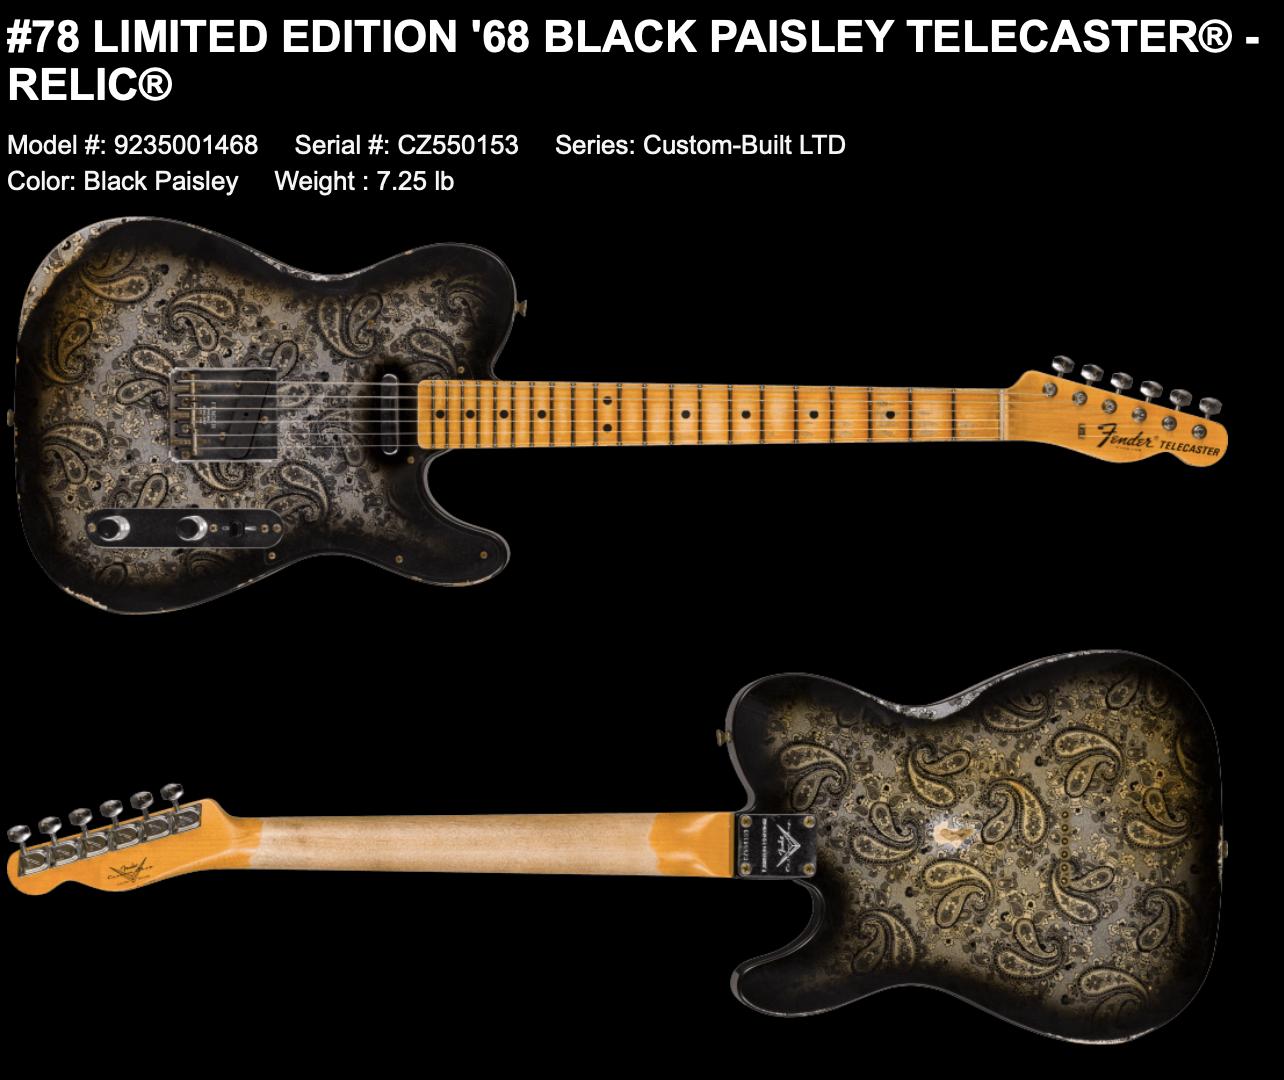 (PRE-ORDER) FENDER CUSTOM SHOP LIMITED EDITION '68 BLACK PAISLEY TELECASTER RELIC